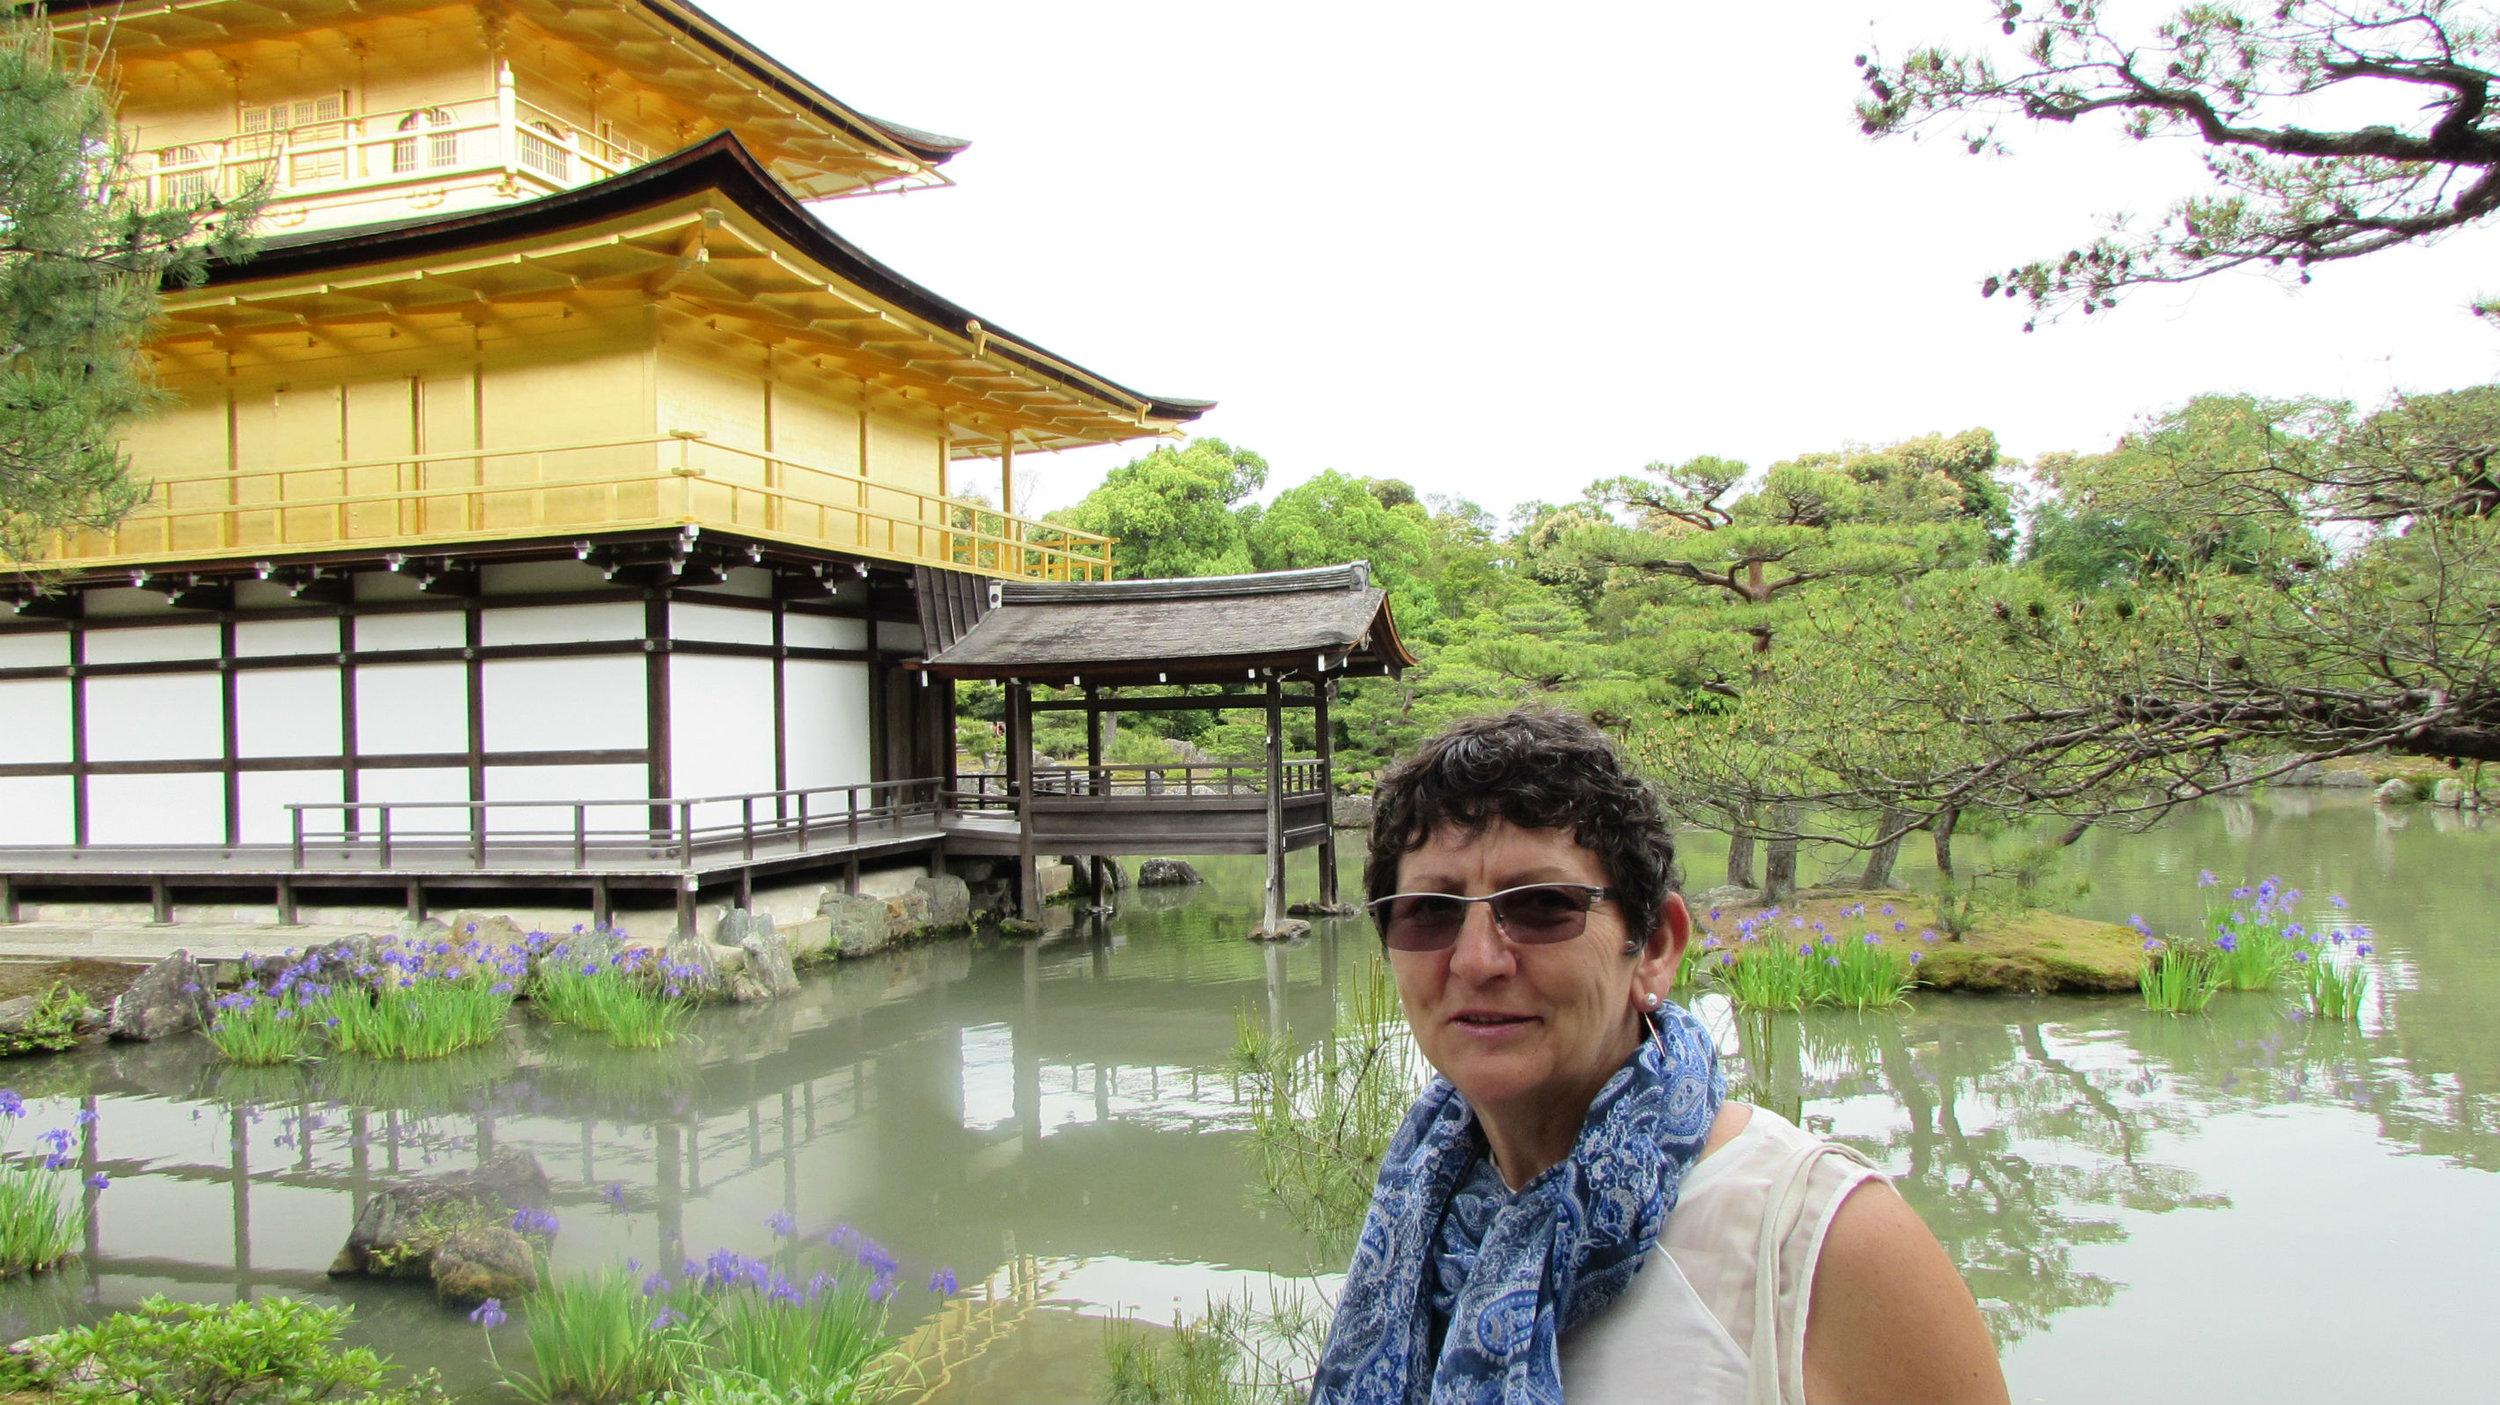 The golden paviljon in the Kinkaku Ji Temple in Kyoto